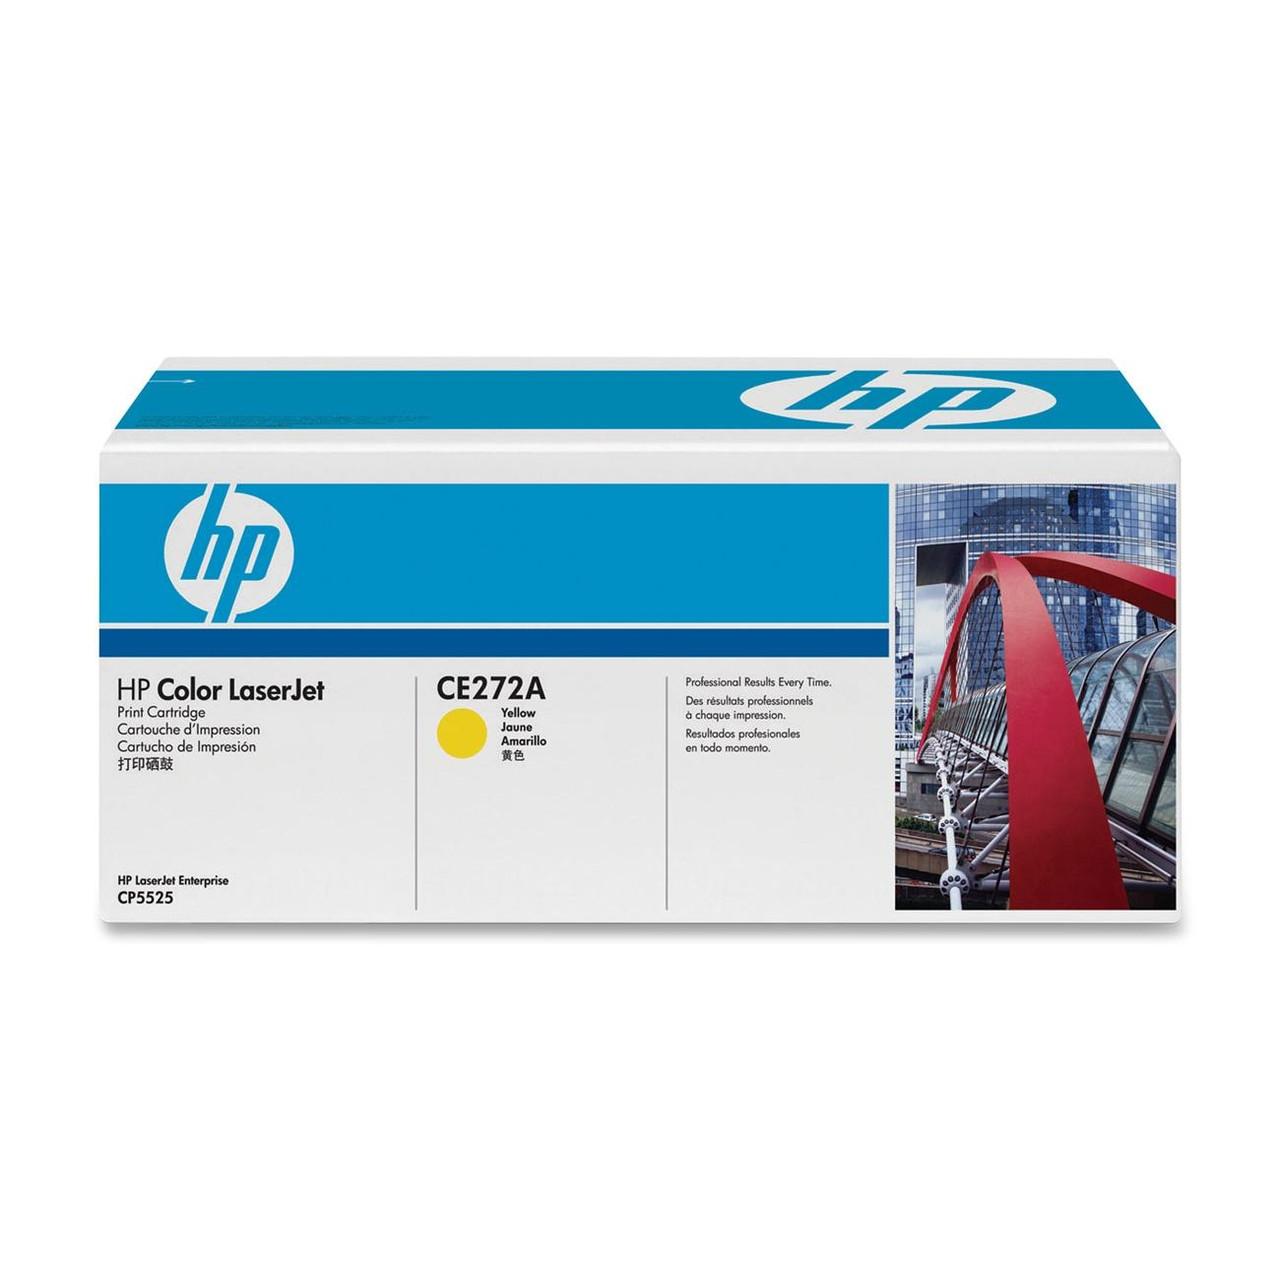 Тонер-картридж HP 650A CLJ CE271A Yellow 15000 страниц